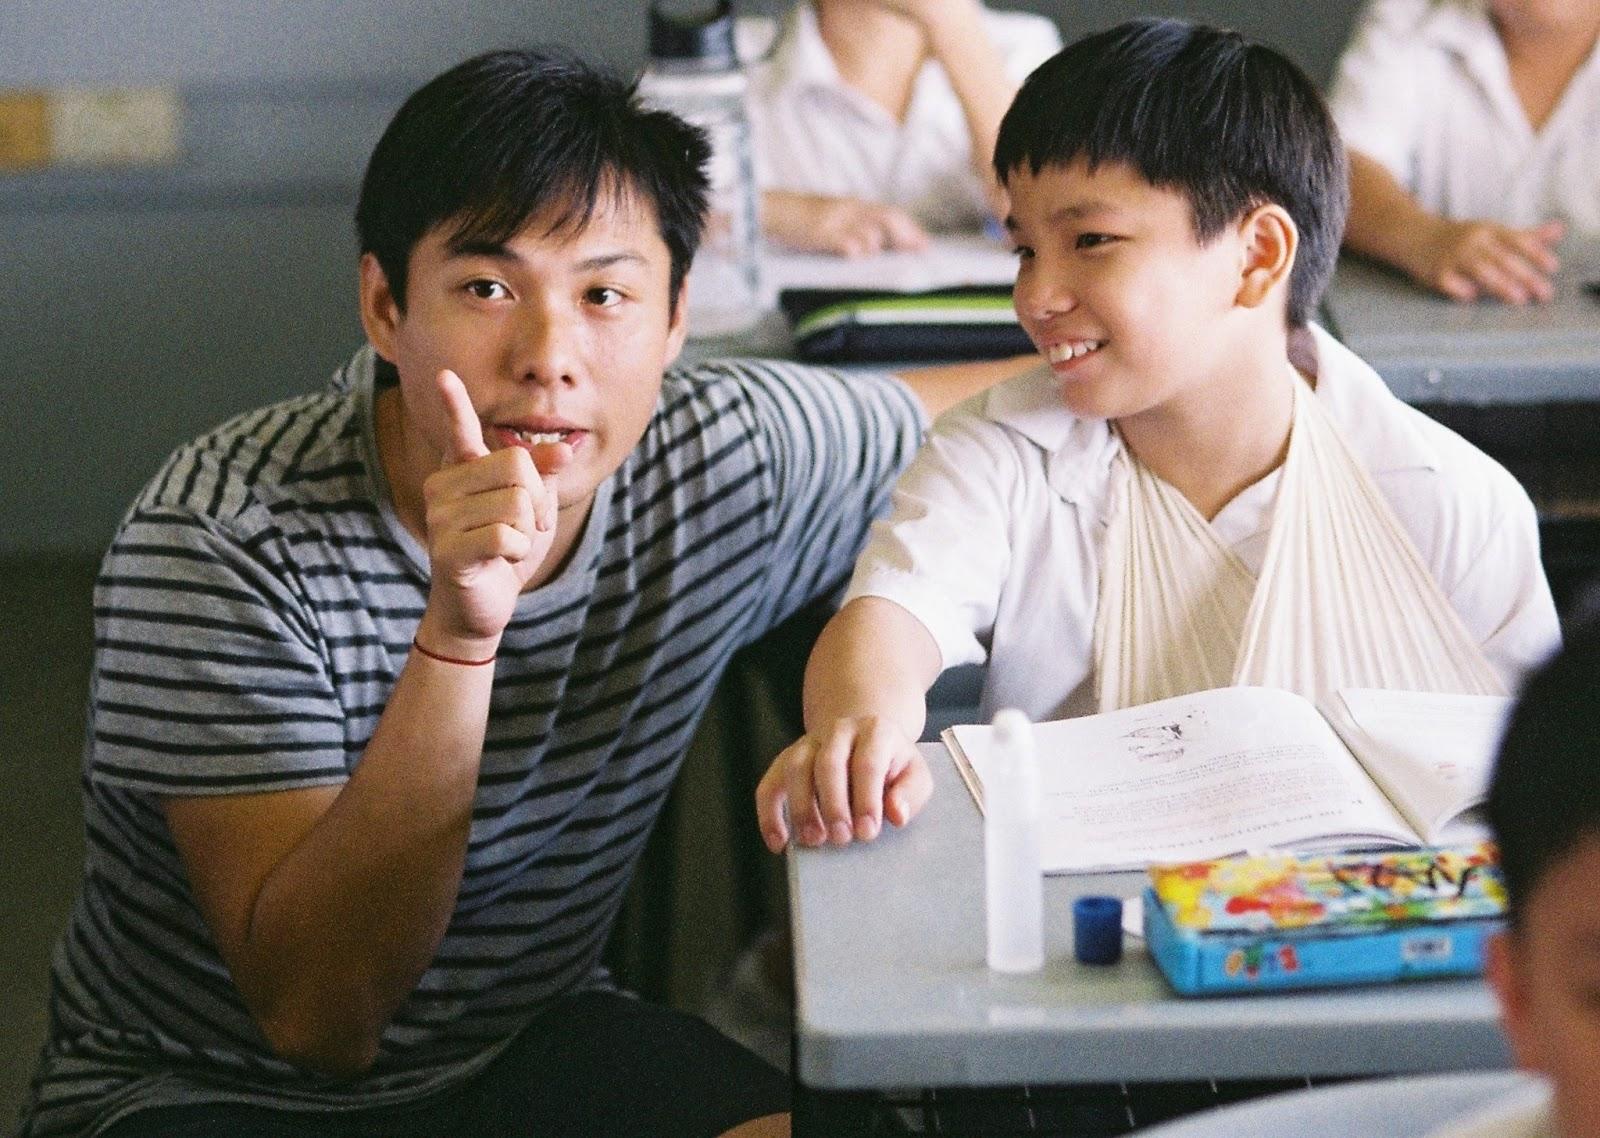 est100 一些攝影(some photos): Anthony Chen. 'Ilo Ilo'. 陳哲藝. '爸媽不在家'